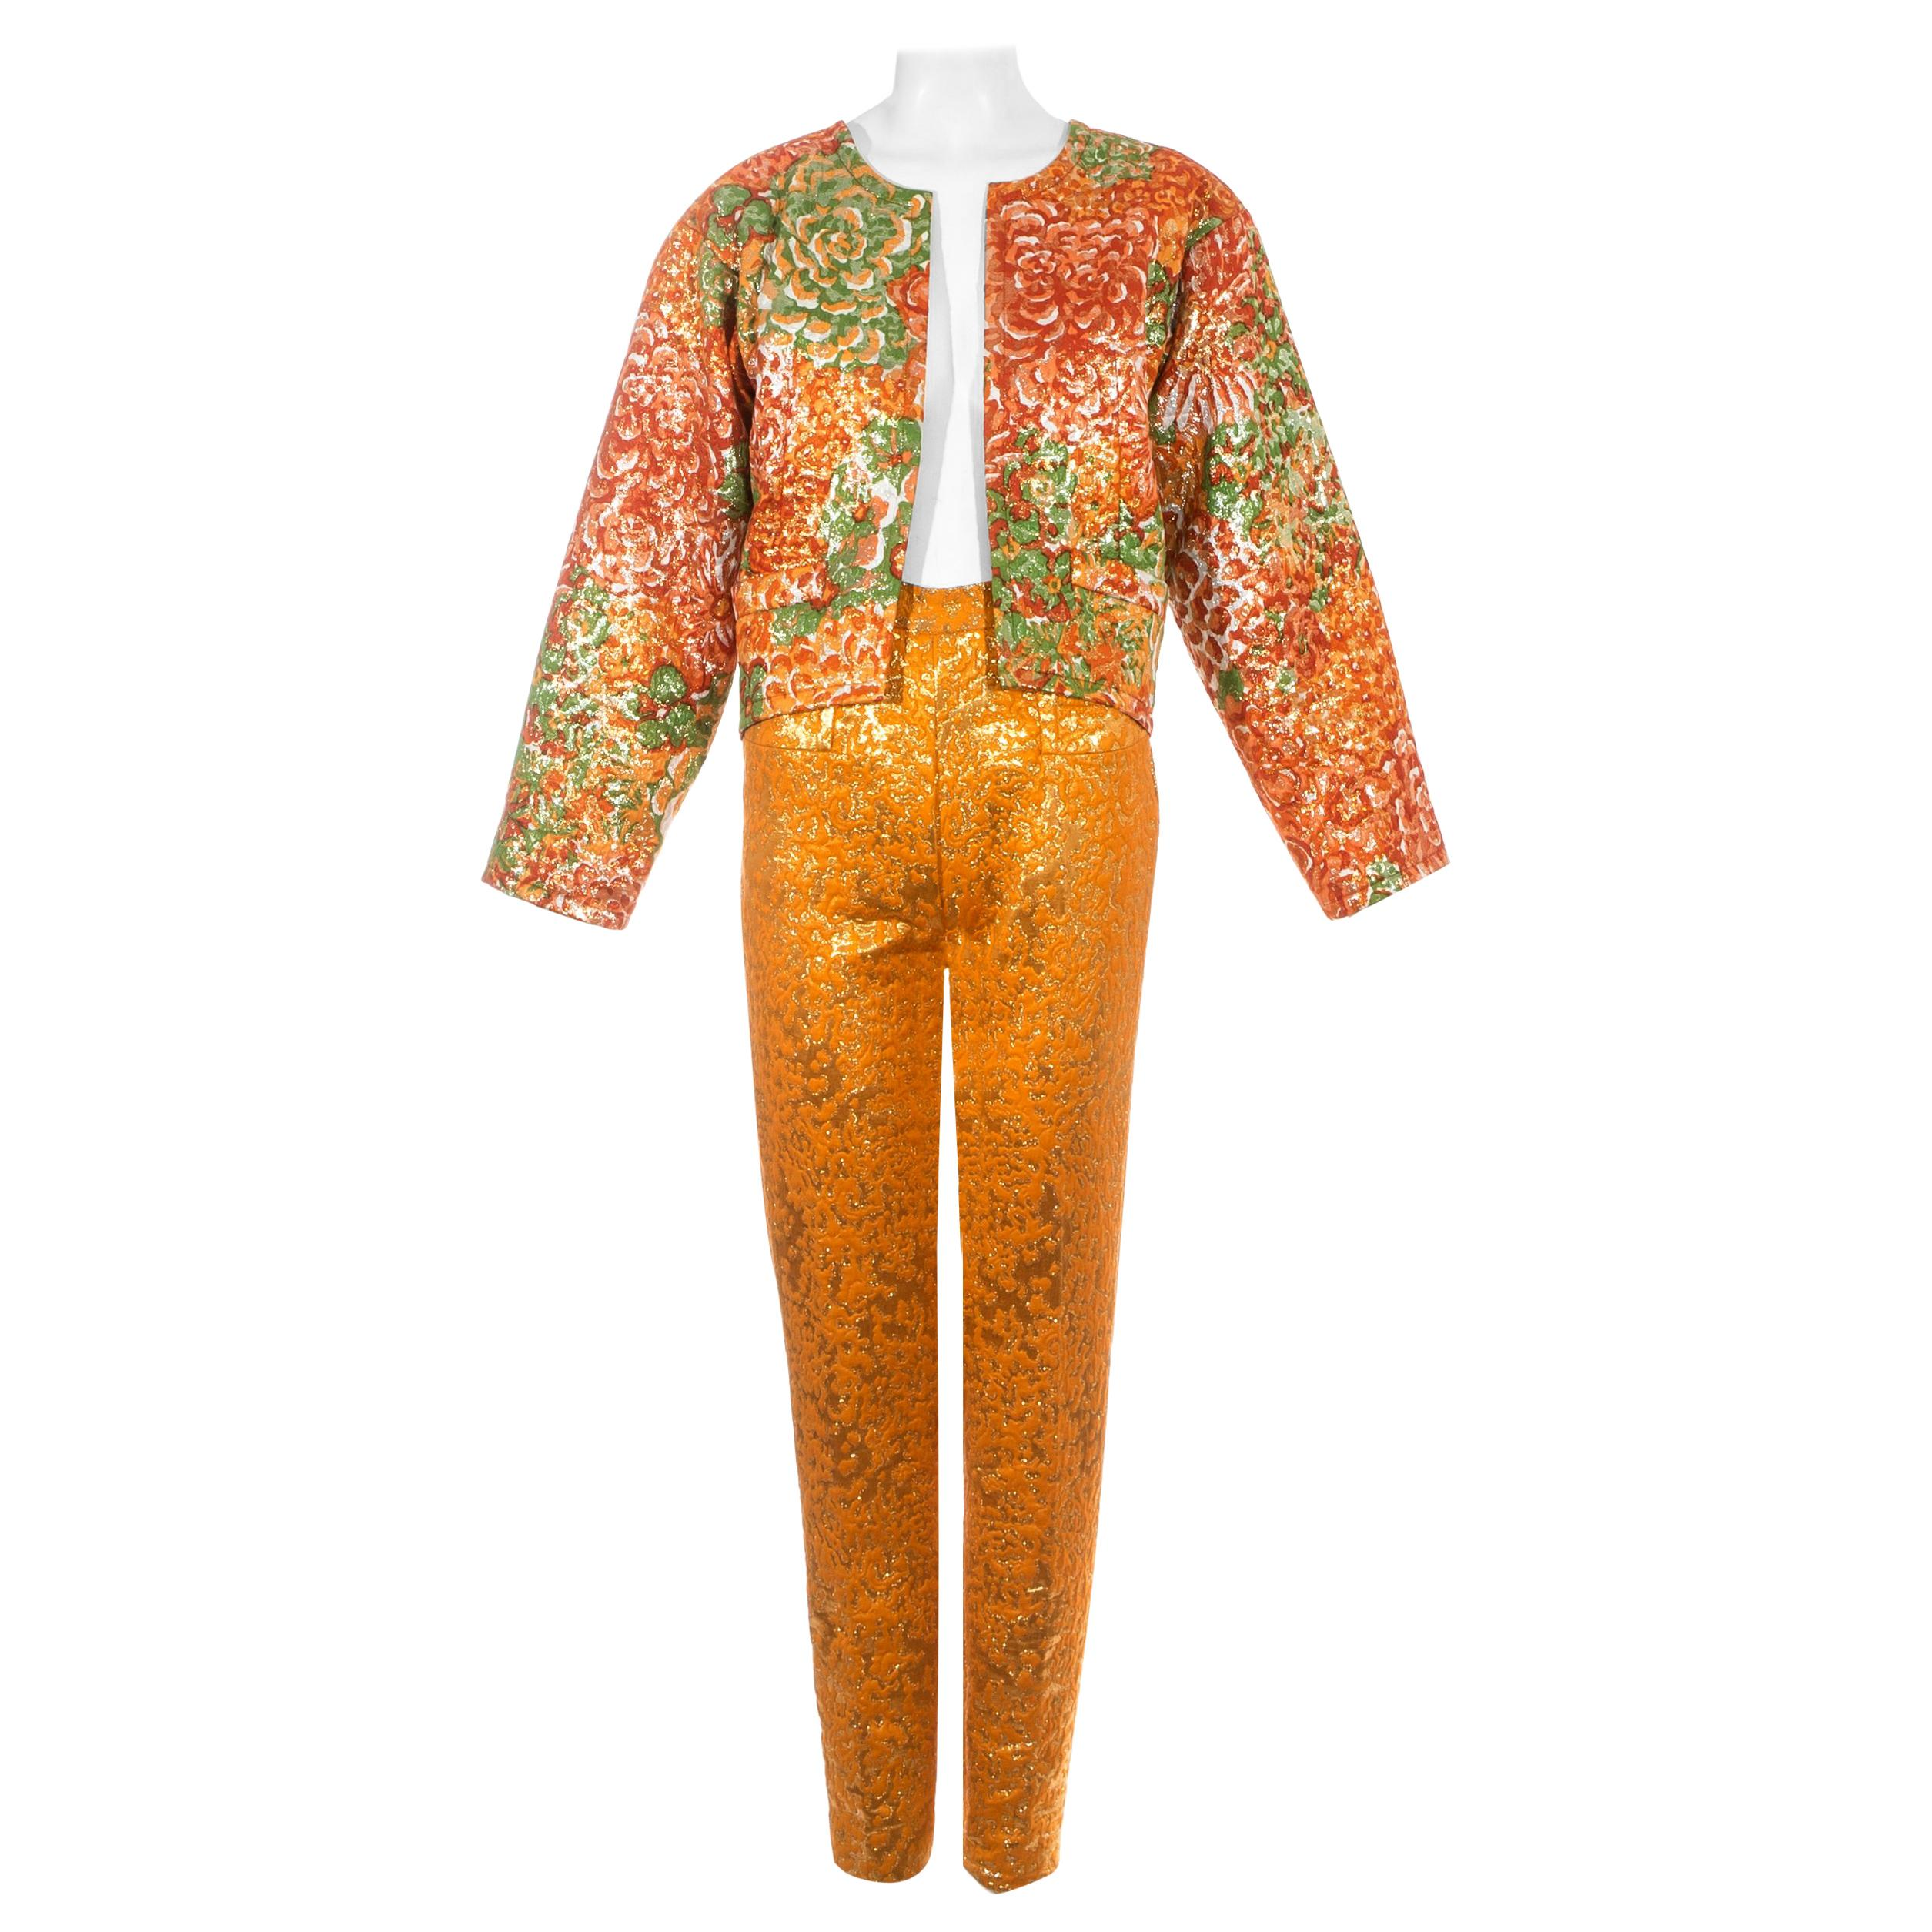 Yves Saint Laurent orange metallic floral brocade evening pant suit, fw 1989